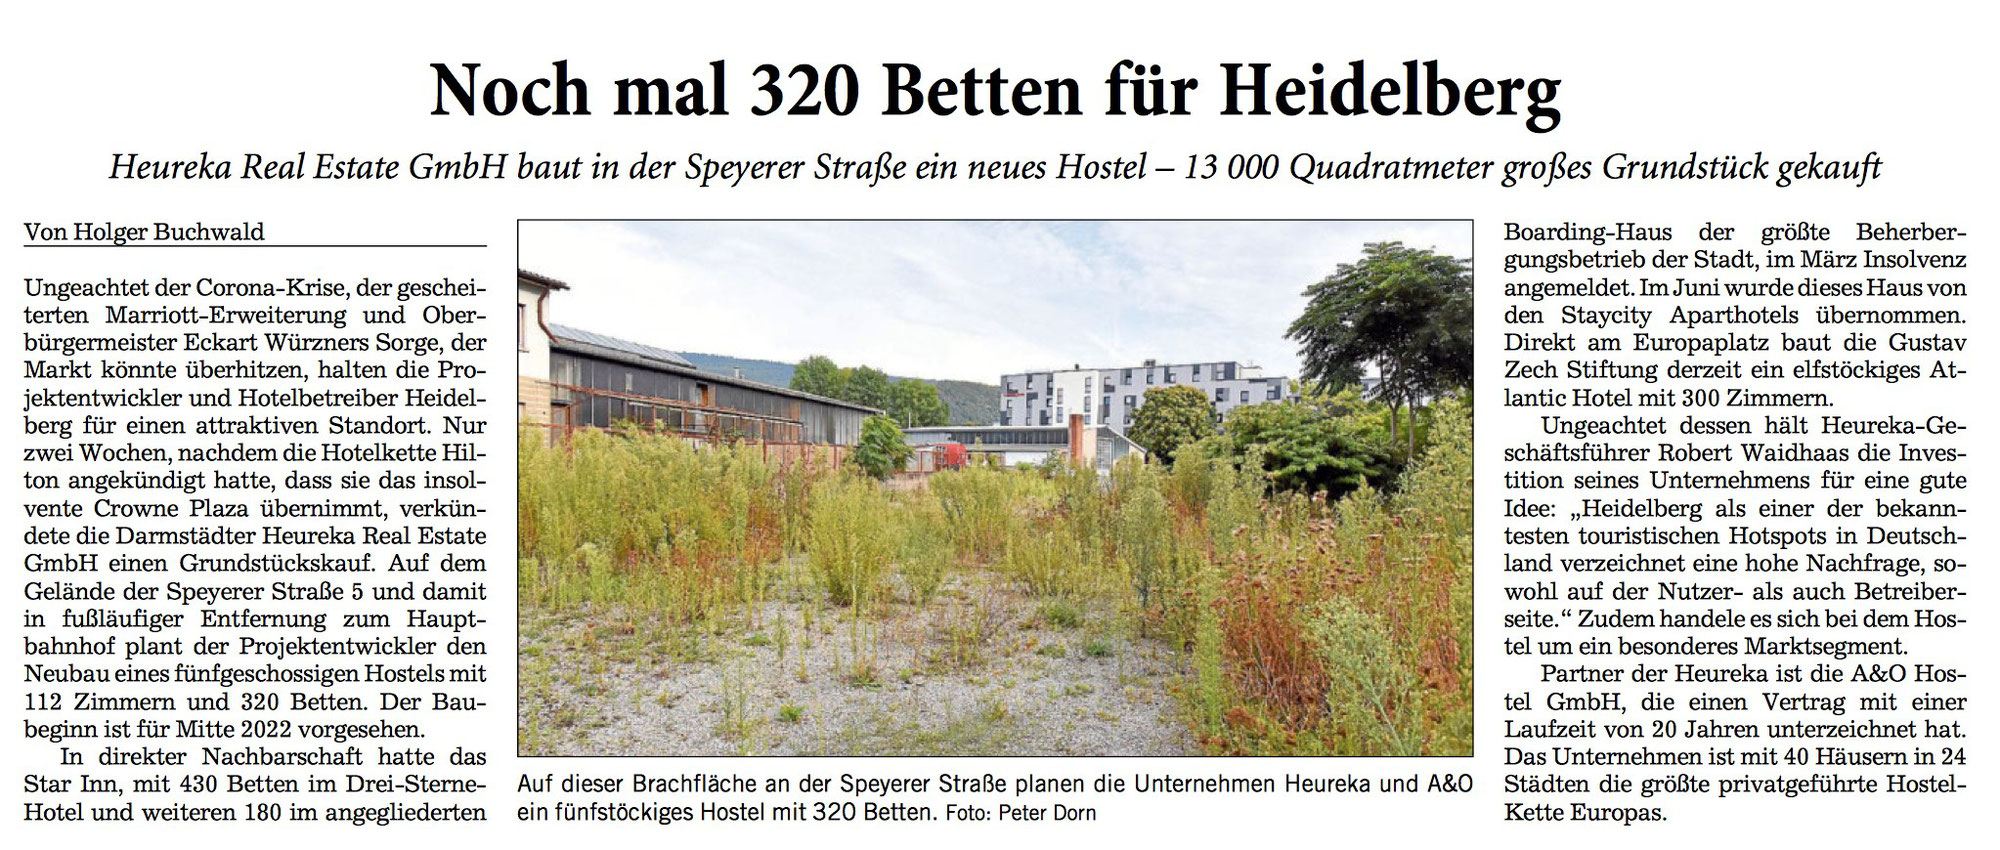 """Noch mal 320 Betten für Heidelberg"" - GEHTS NOCH ?"